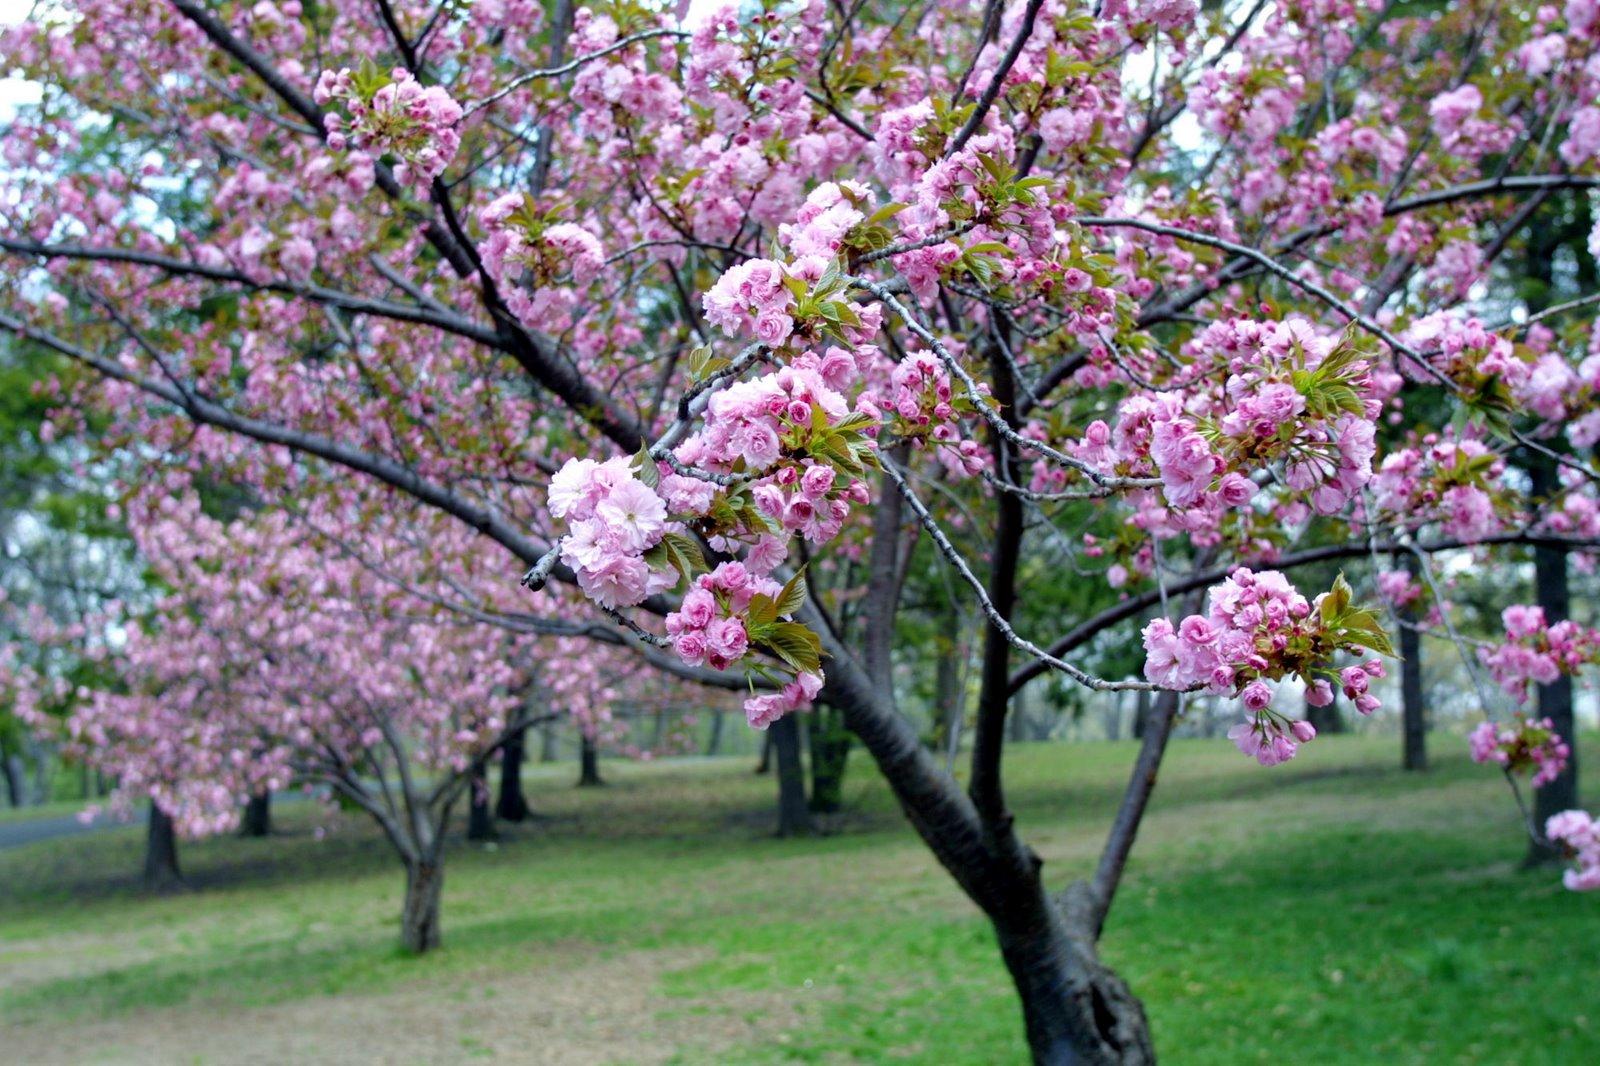 Mavis Fitzpatrick cherry blossom flower wallpaper